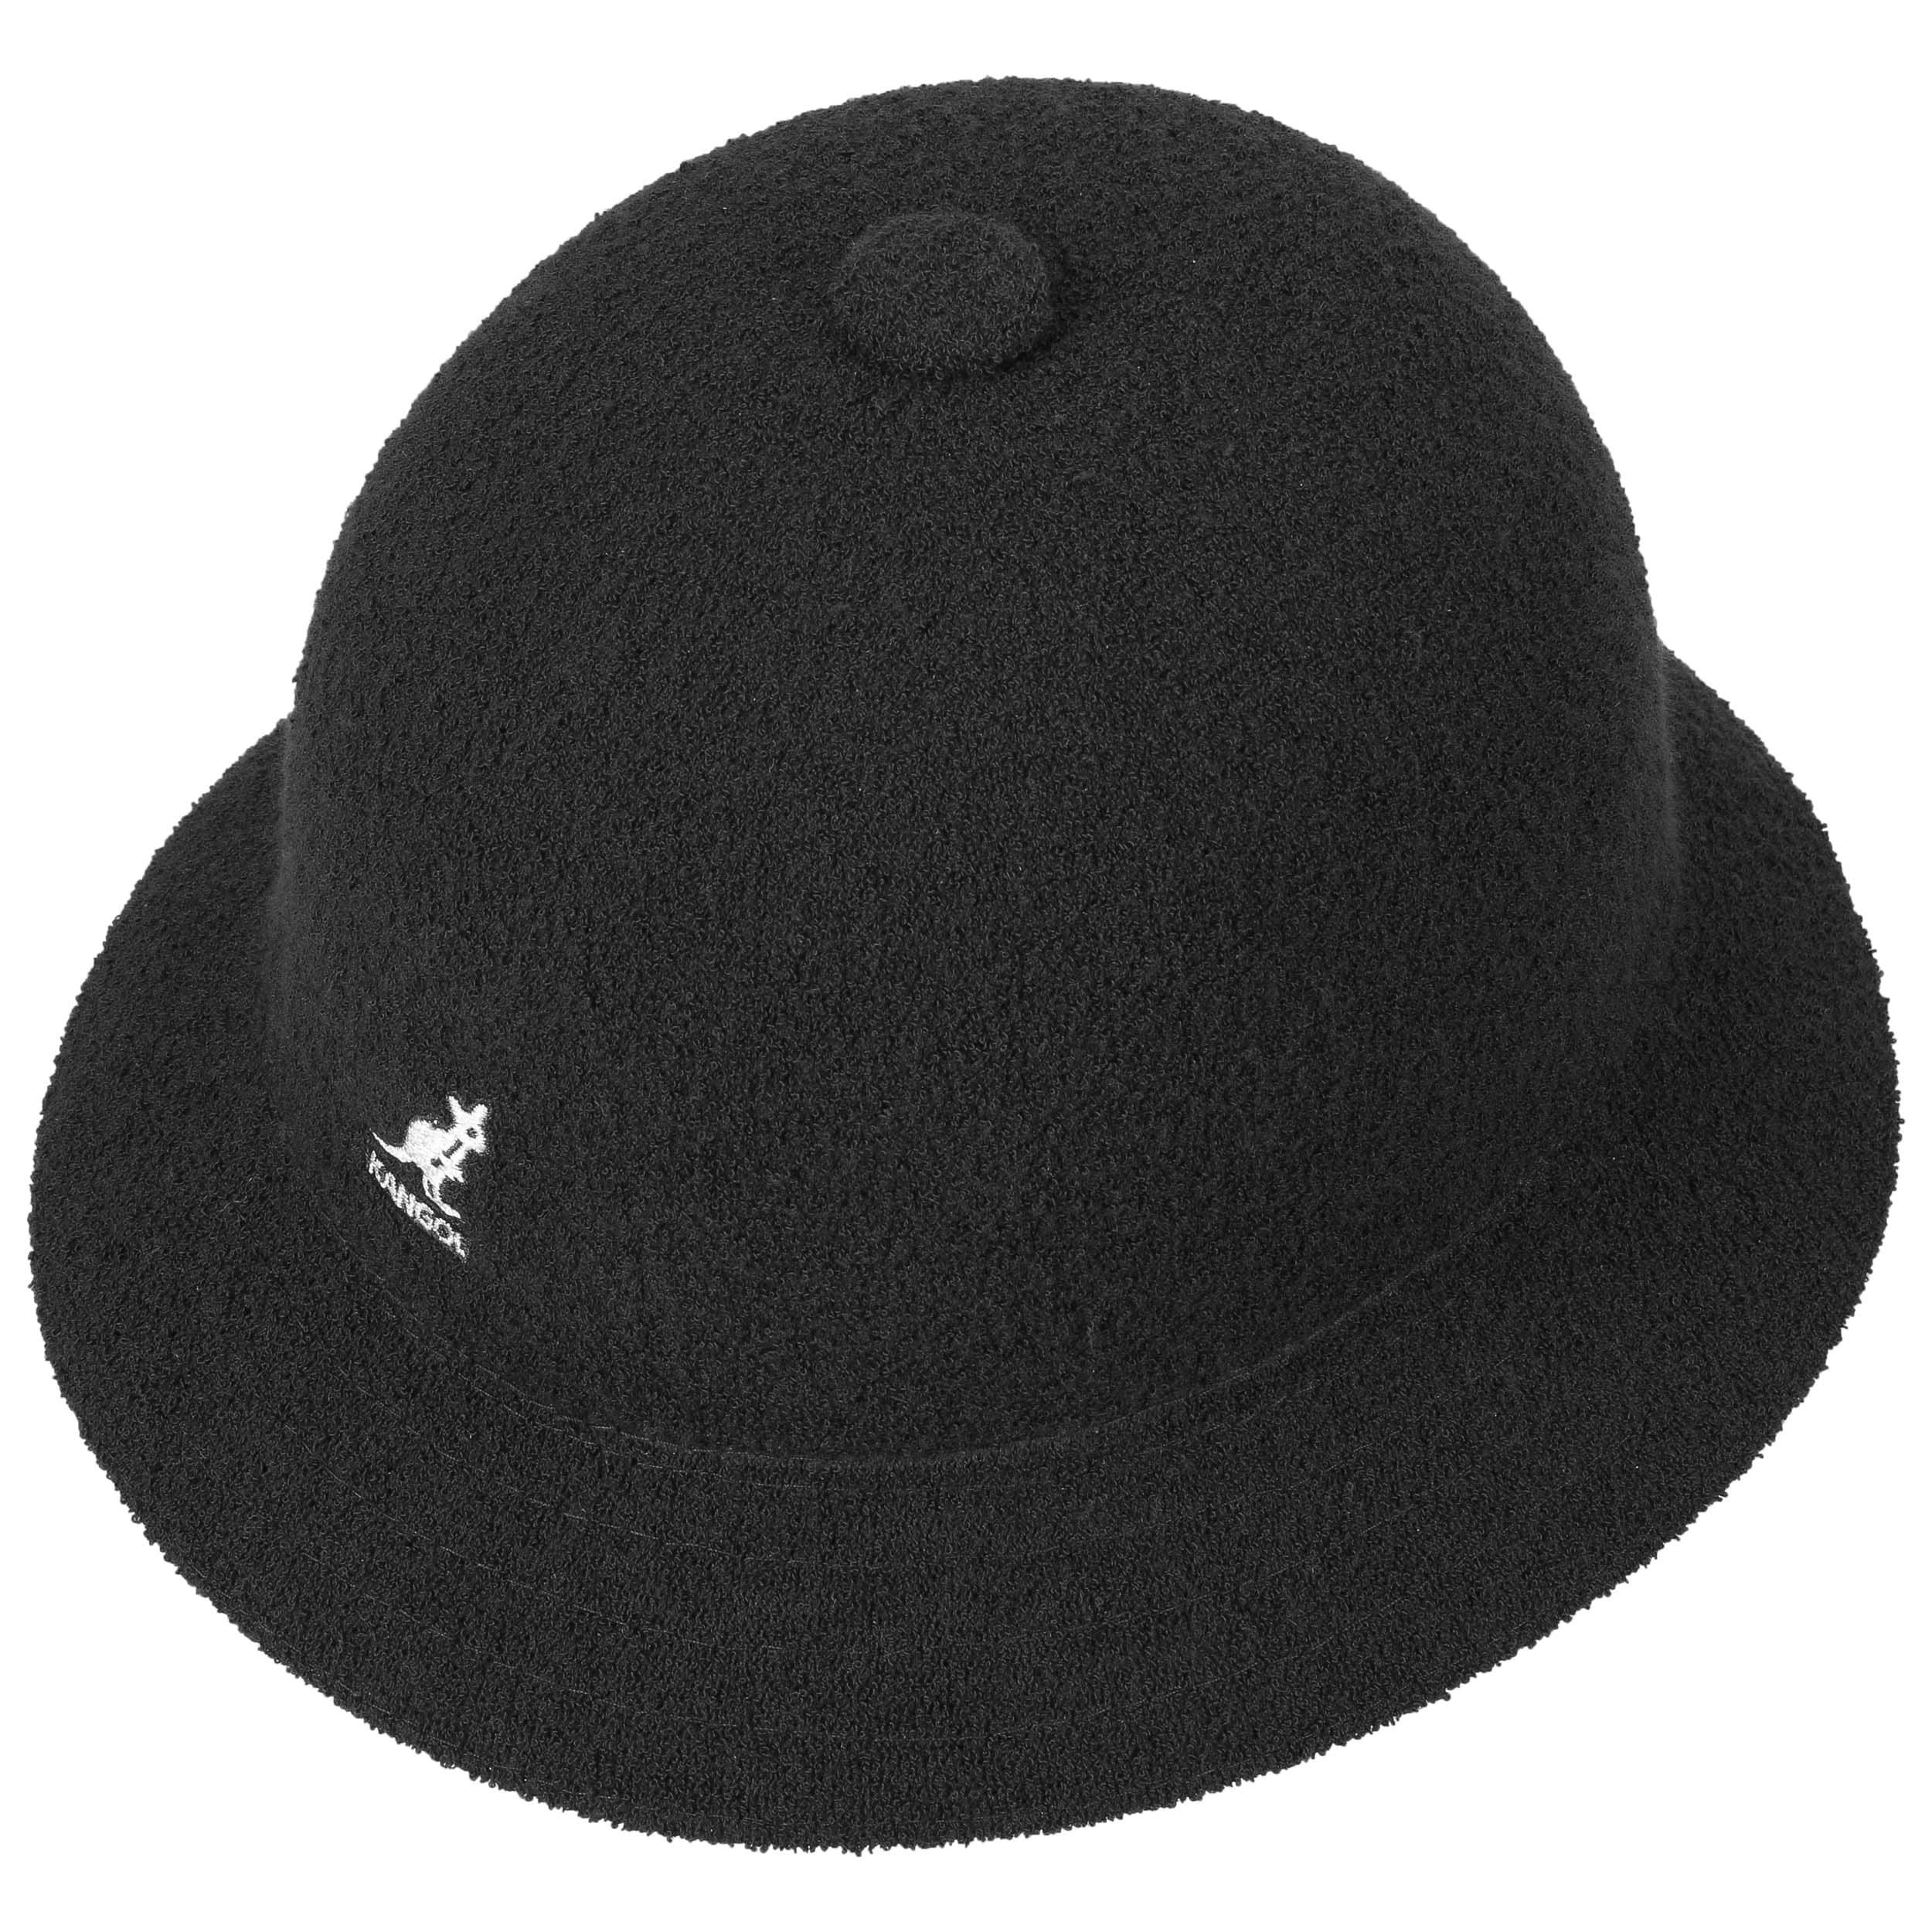 d07487a57 Bermuda Casual Bucket Hat by Kangol